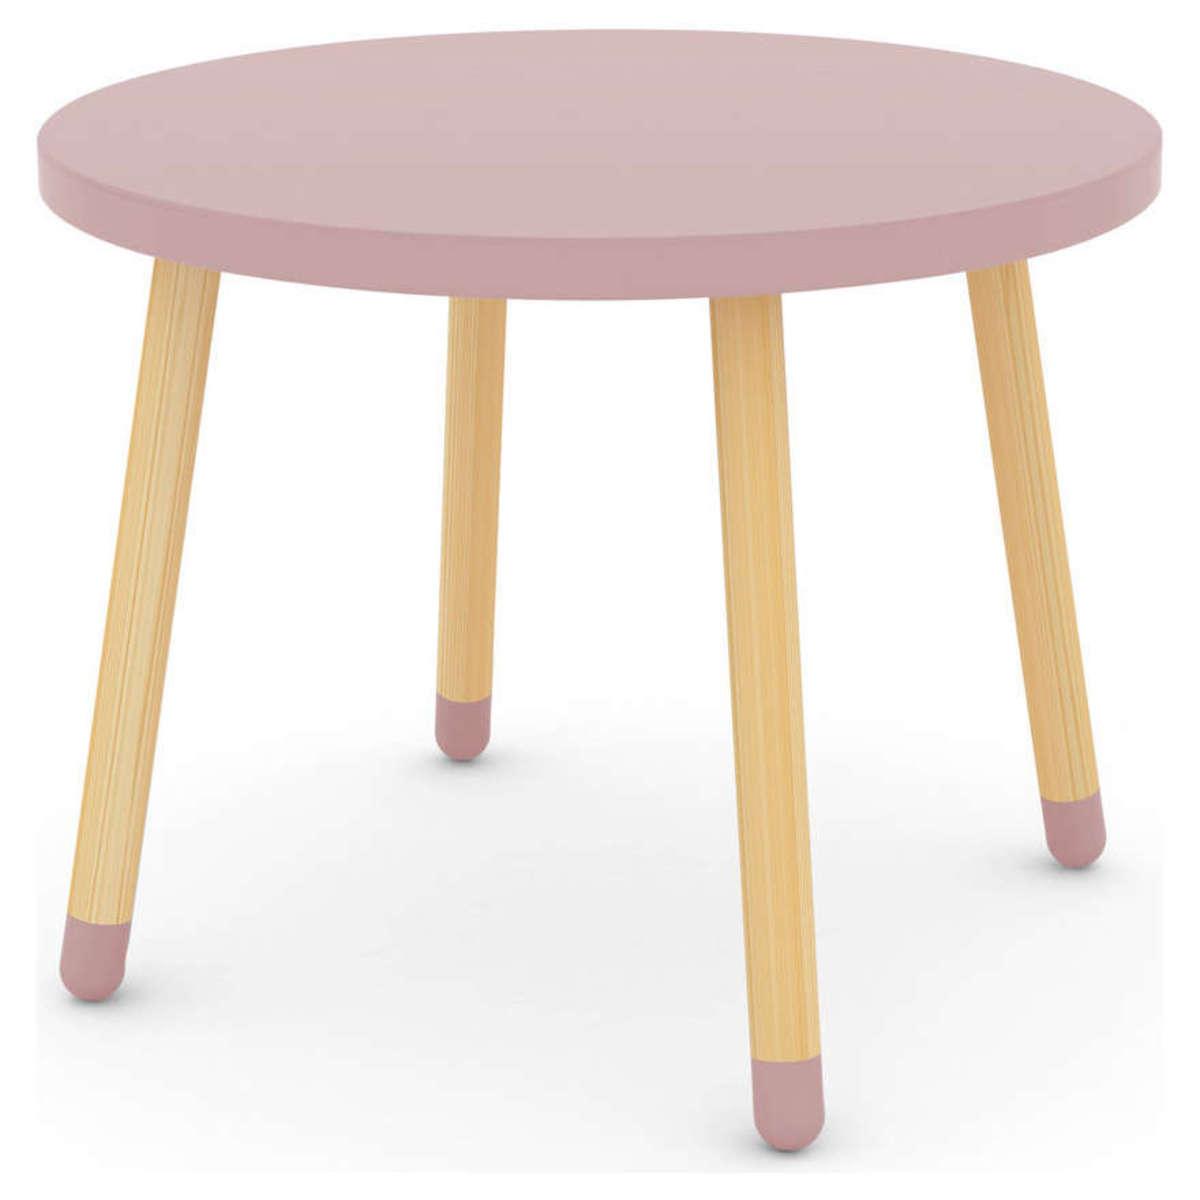 Table & Chaise Table PLAY - Rose Table PLAY - Rose